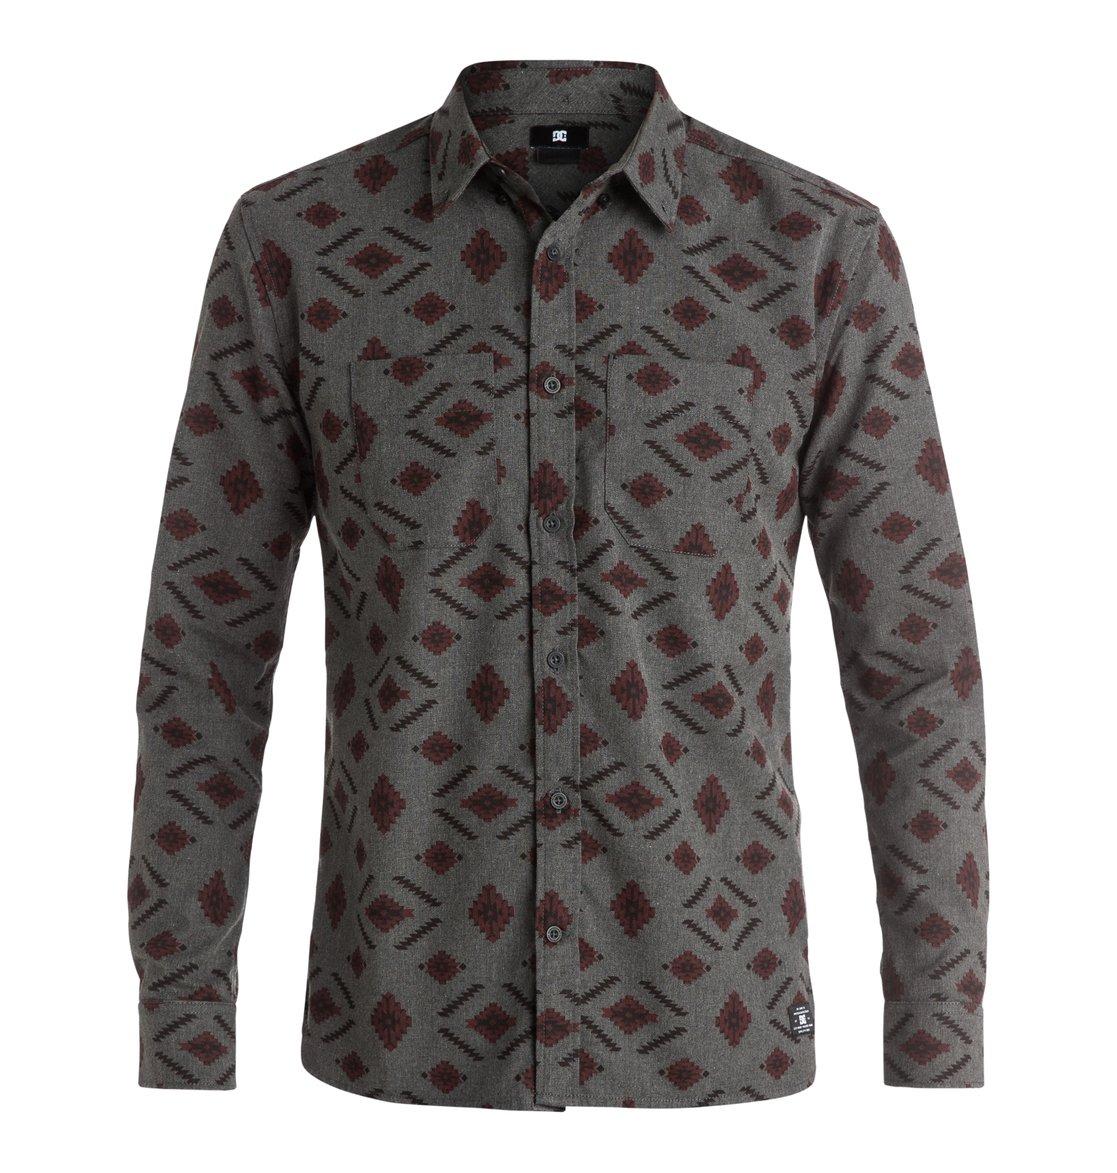 Рубашка Bowen Dale Flannel с длинным рукавом от DC Shoes